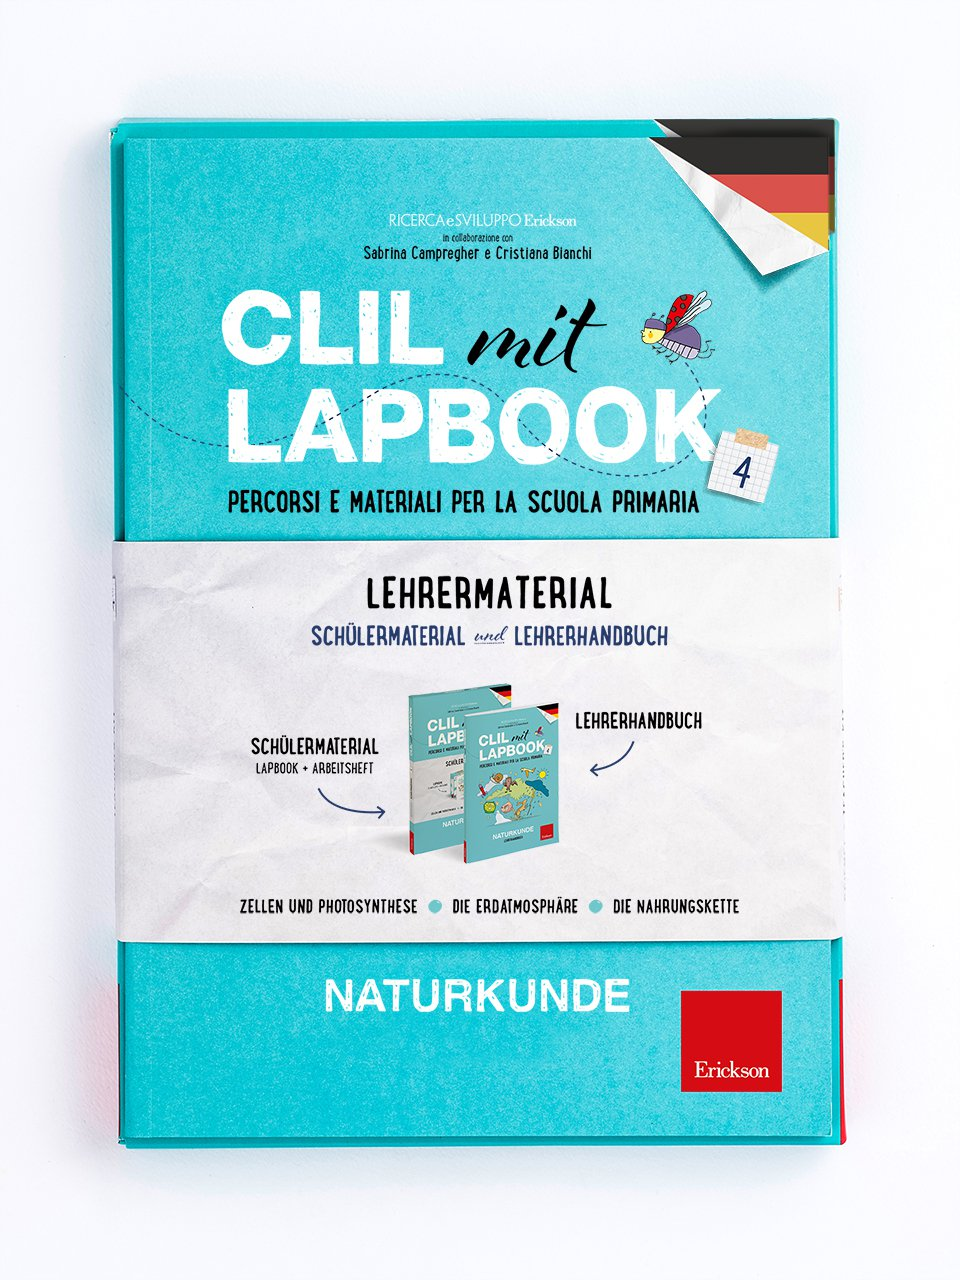 CLIL mit LAPBOOK - Naturkunde - Classe quarta - Ricerca e Sviluppo Erickson  - Erickson